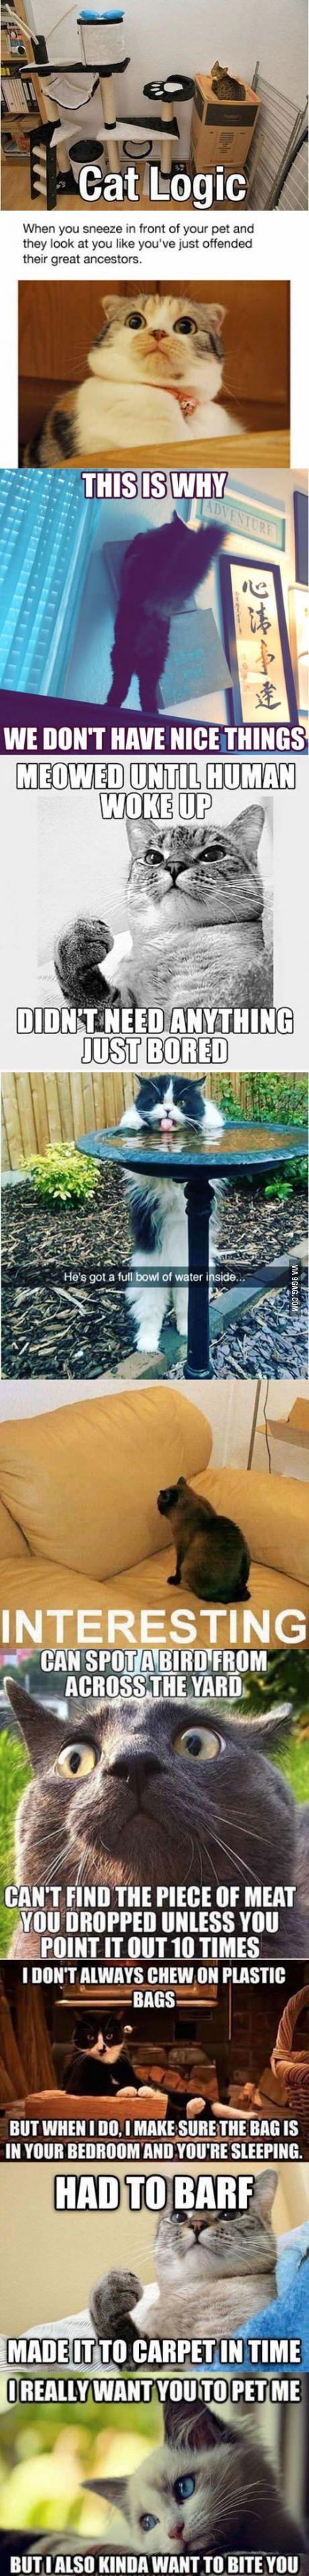 Cat Logic, it all makes sense to me. I want that cat at the bird bath!!!